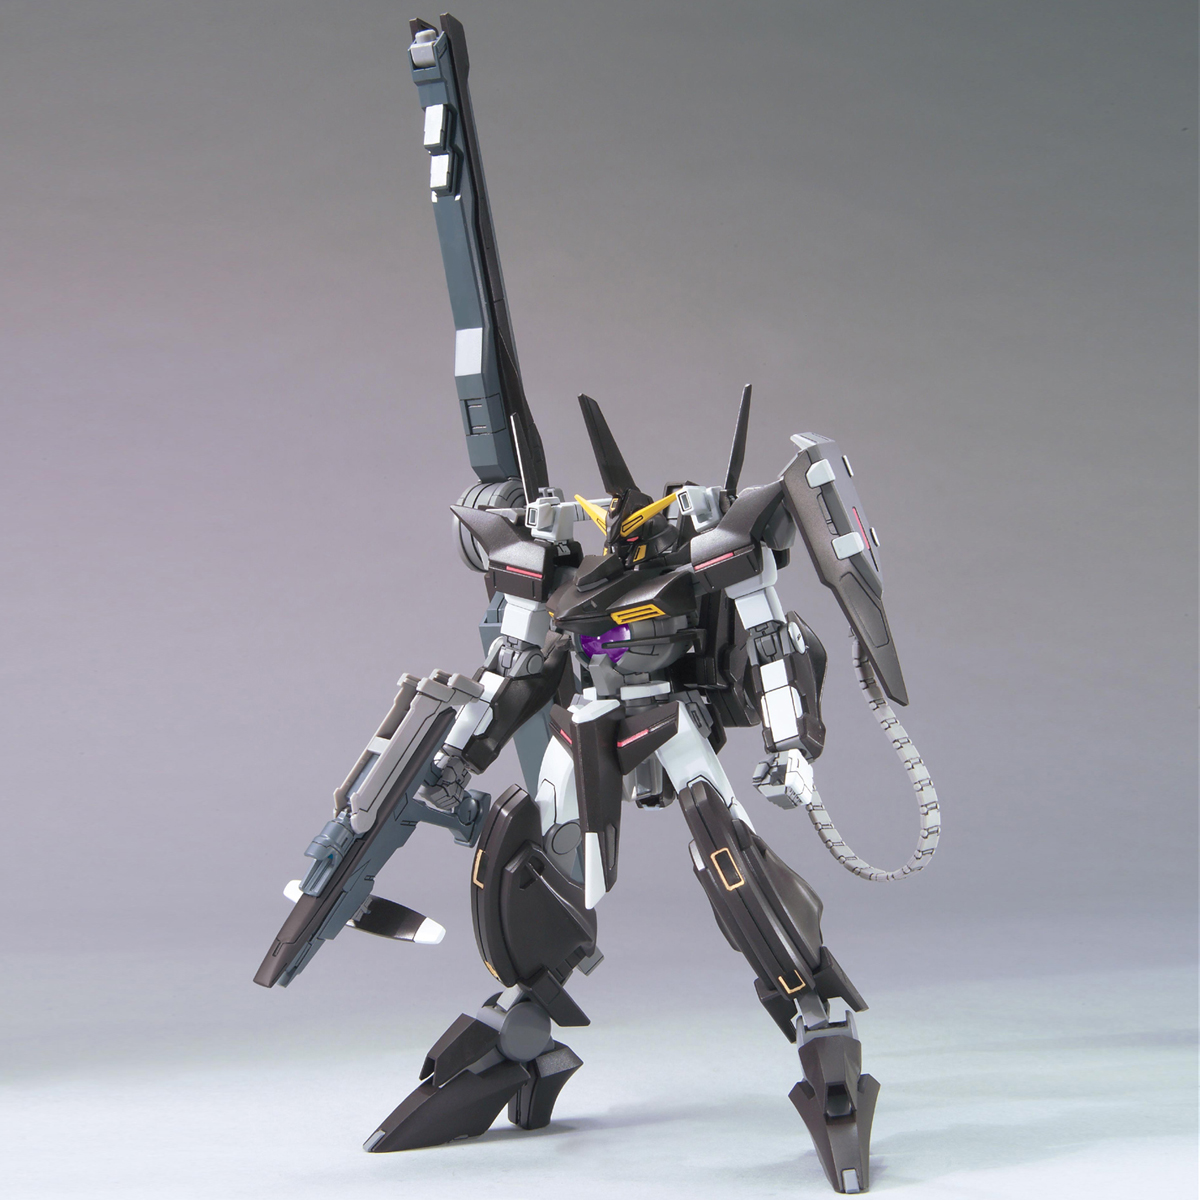 6630HG 1/144 GNW-001 ガンダムスローネアイン [Gundam Throne Eins]